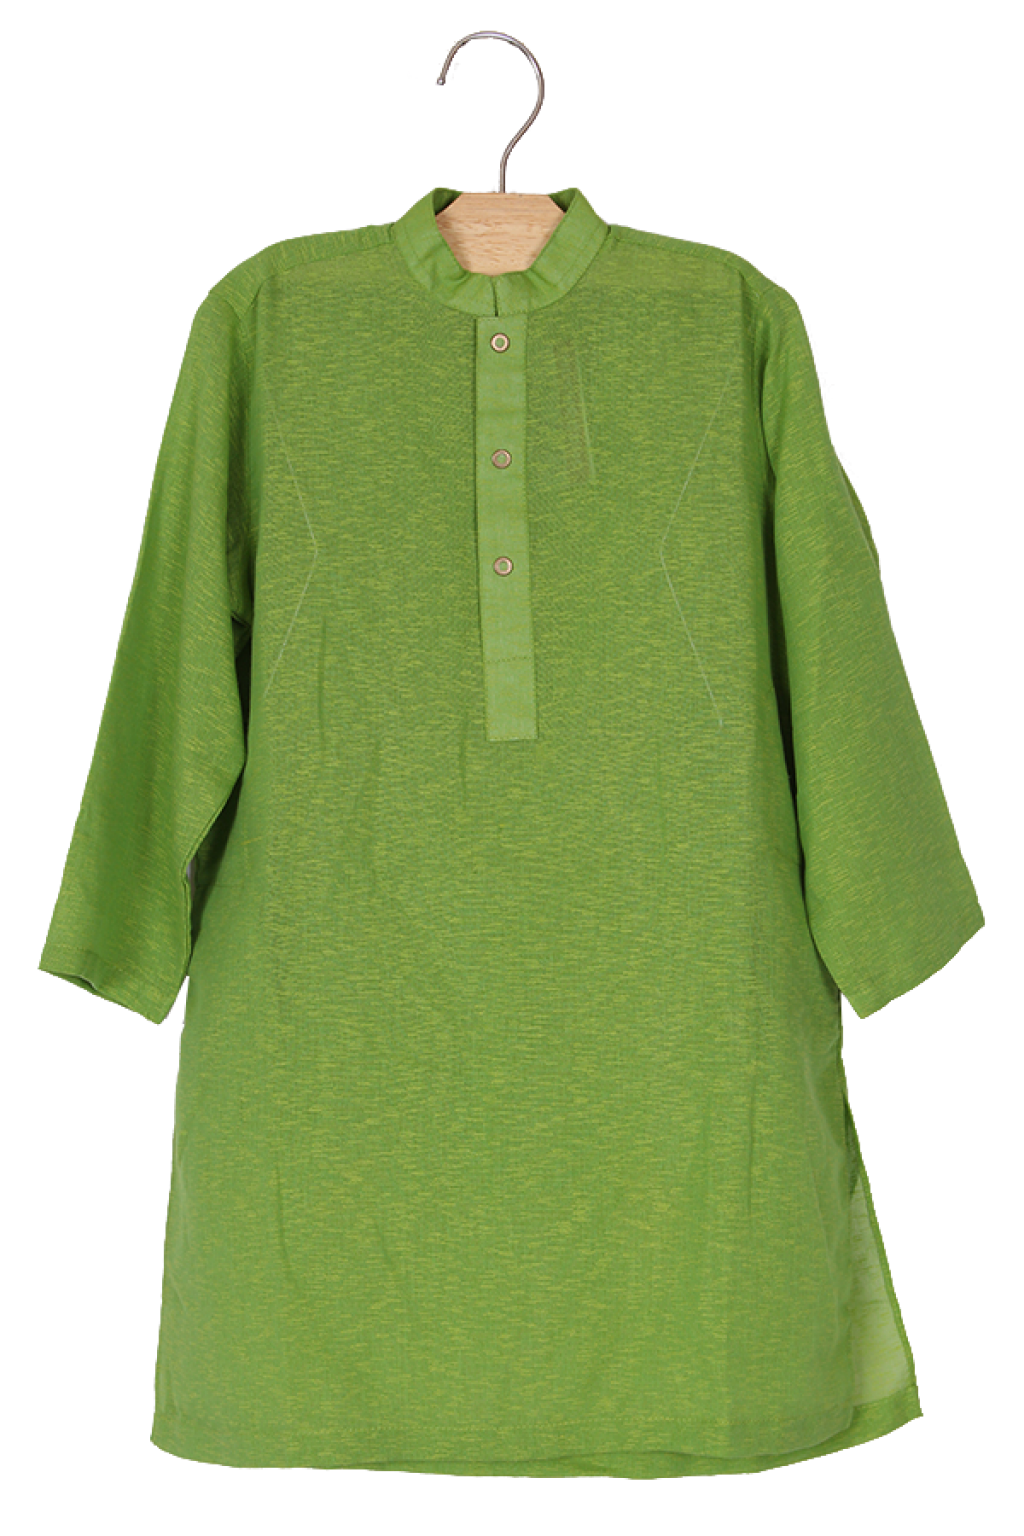 14958043840_Mushrooms_Green_Slub_Karandi_Kurta_for_Eid.png